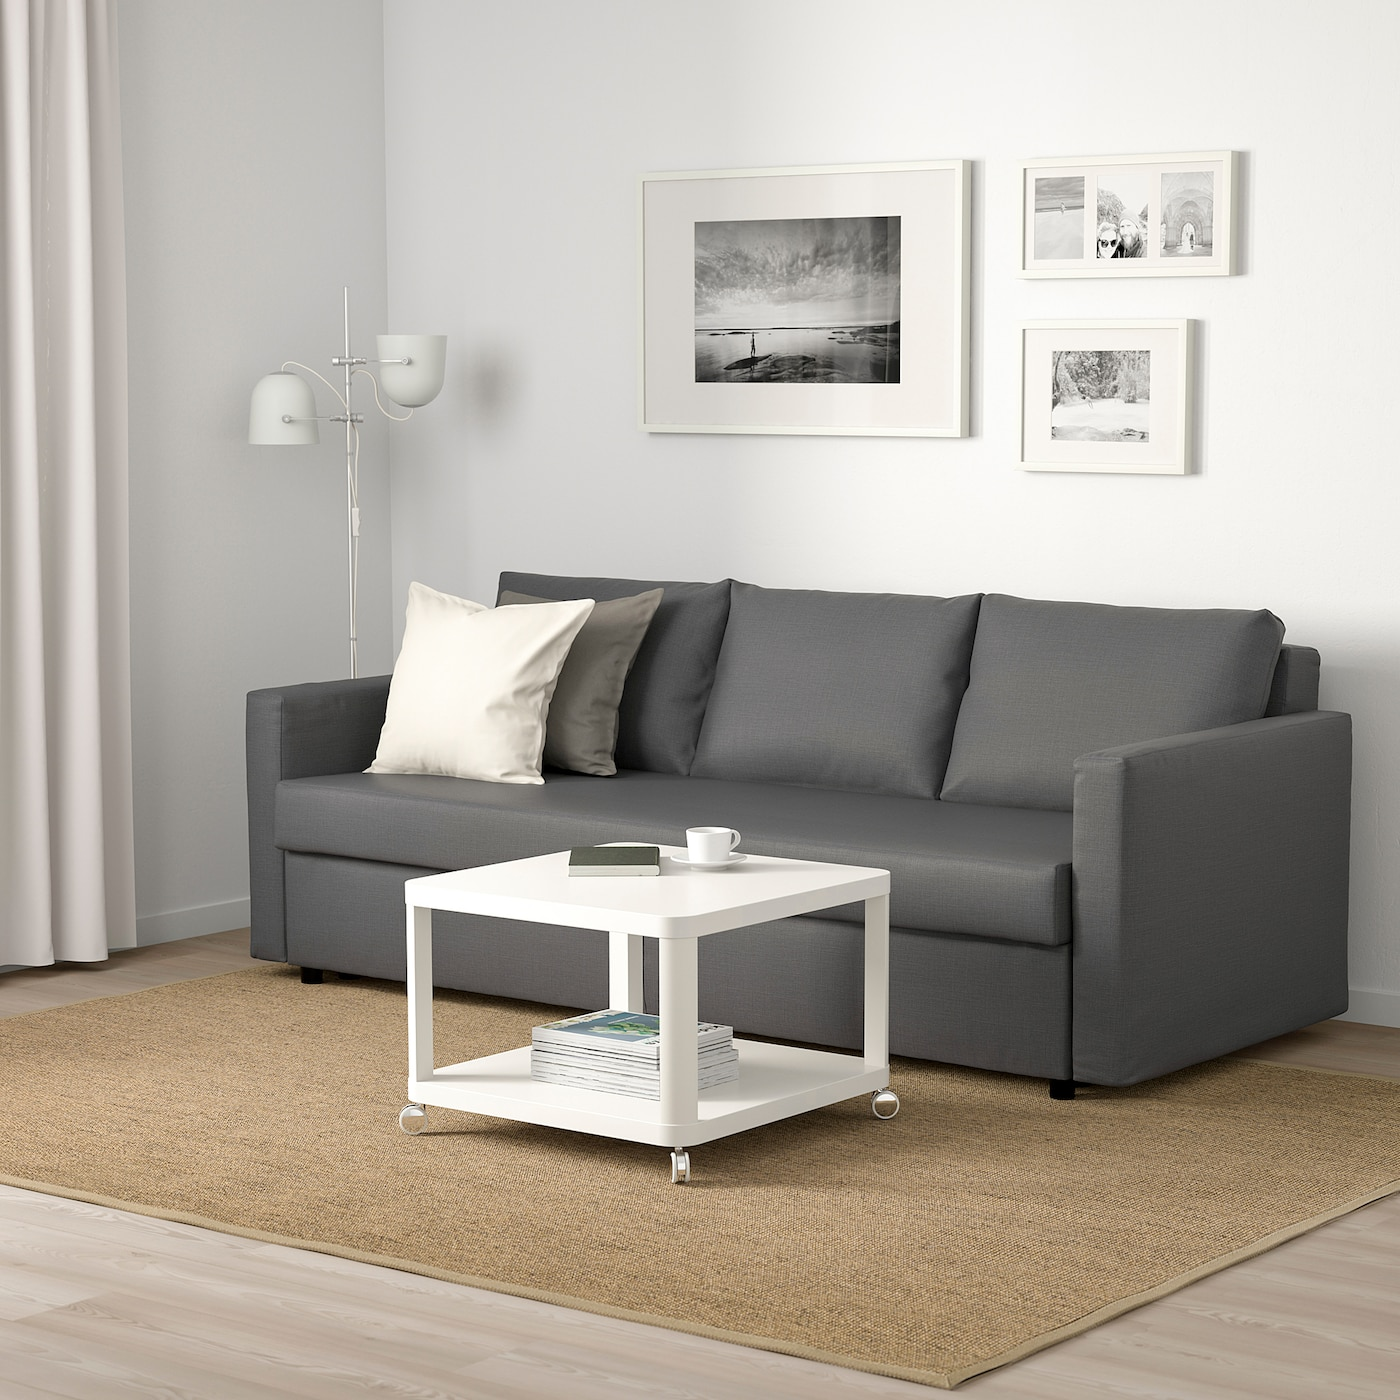 Picture of: Friheten Sleeper Sofa Skiftebo Dark Gray Ikea